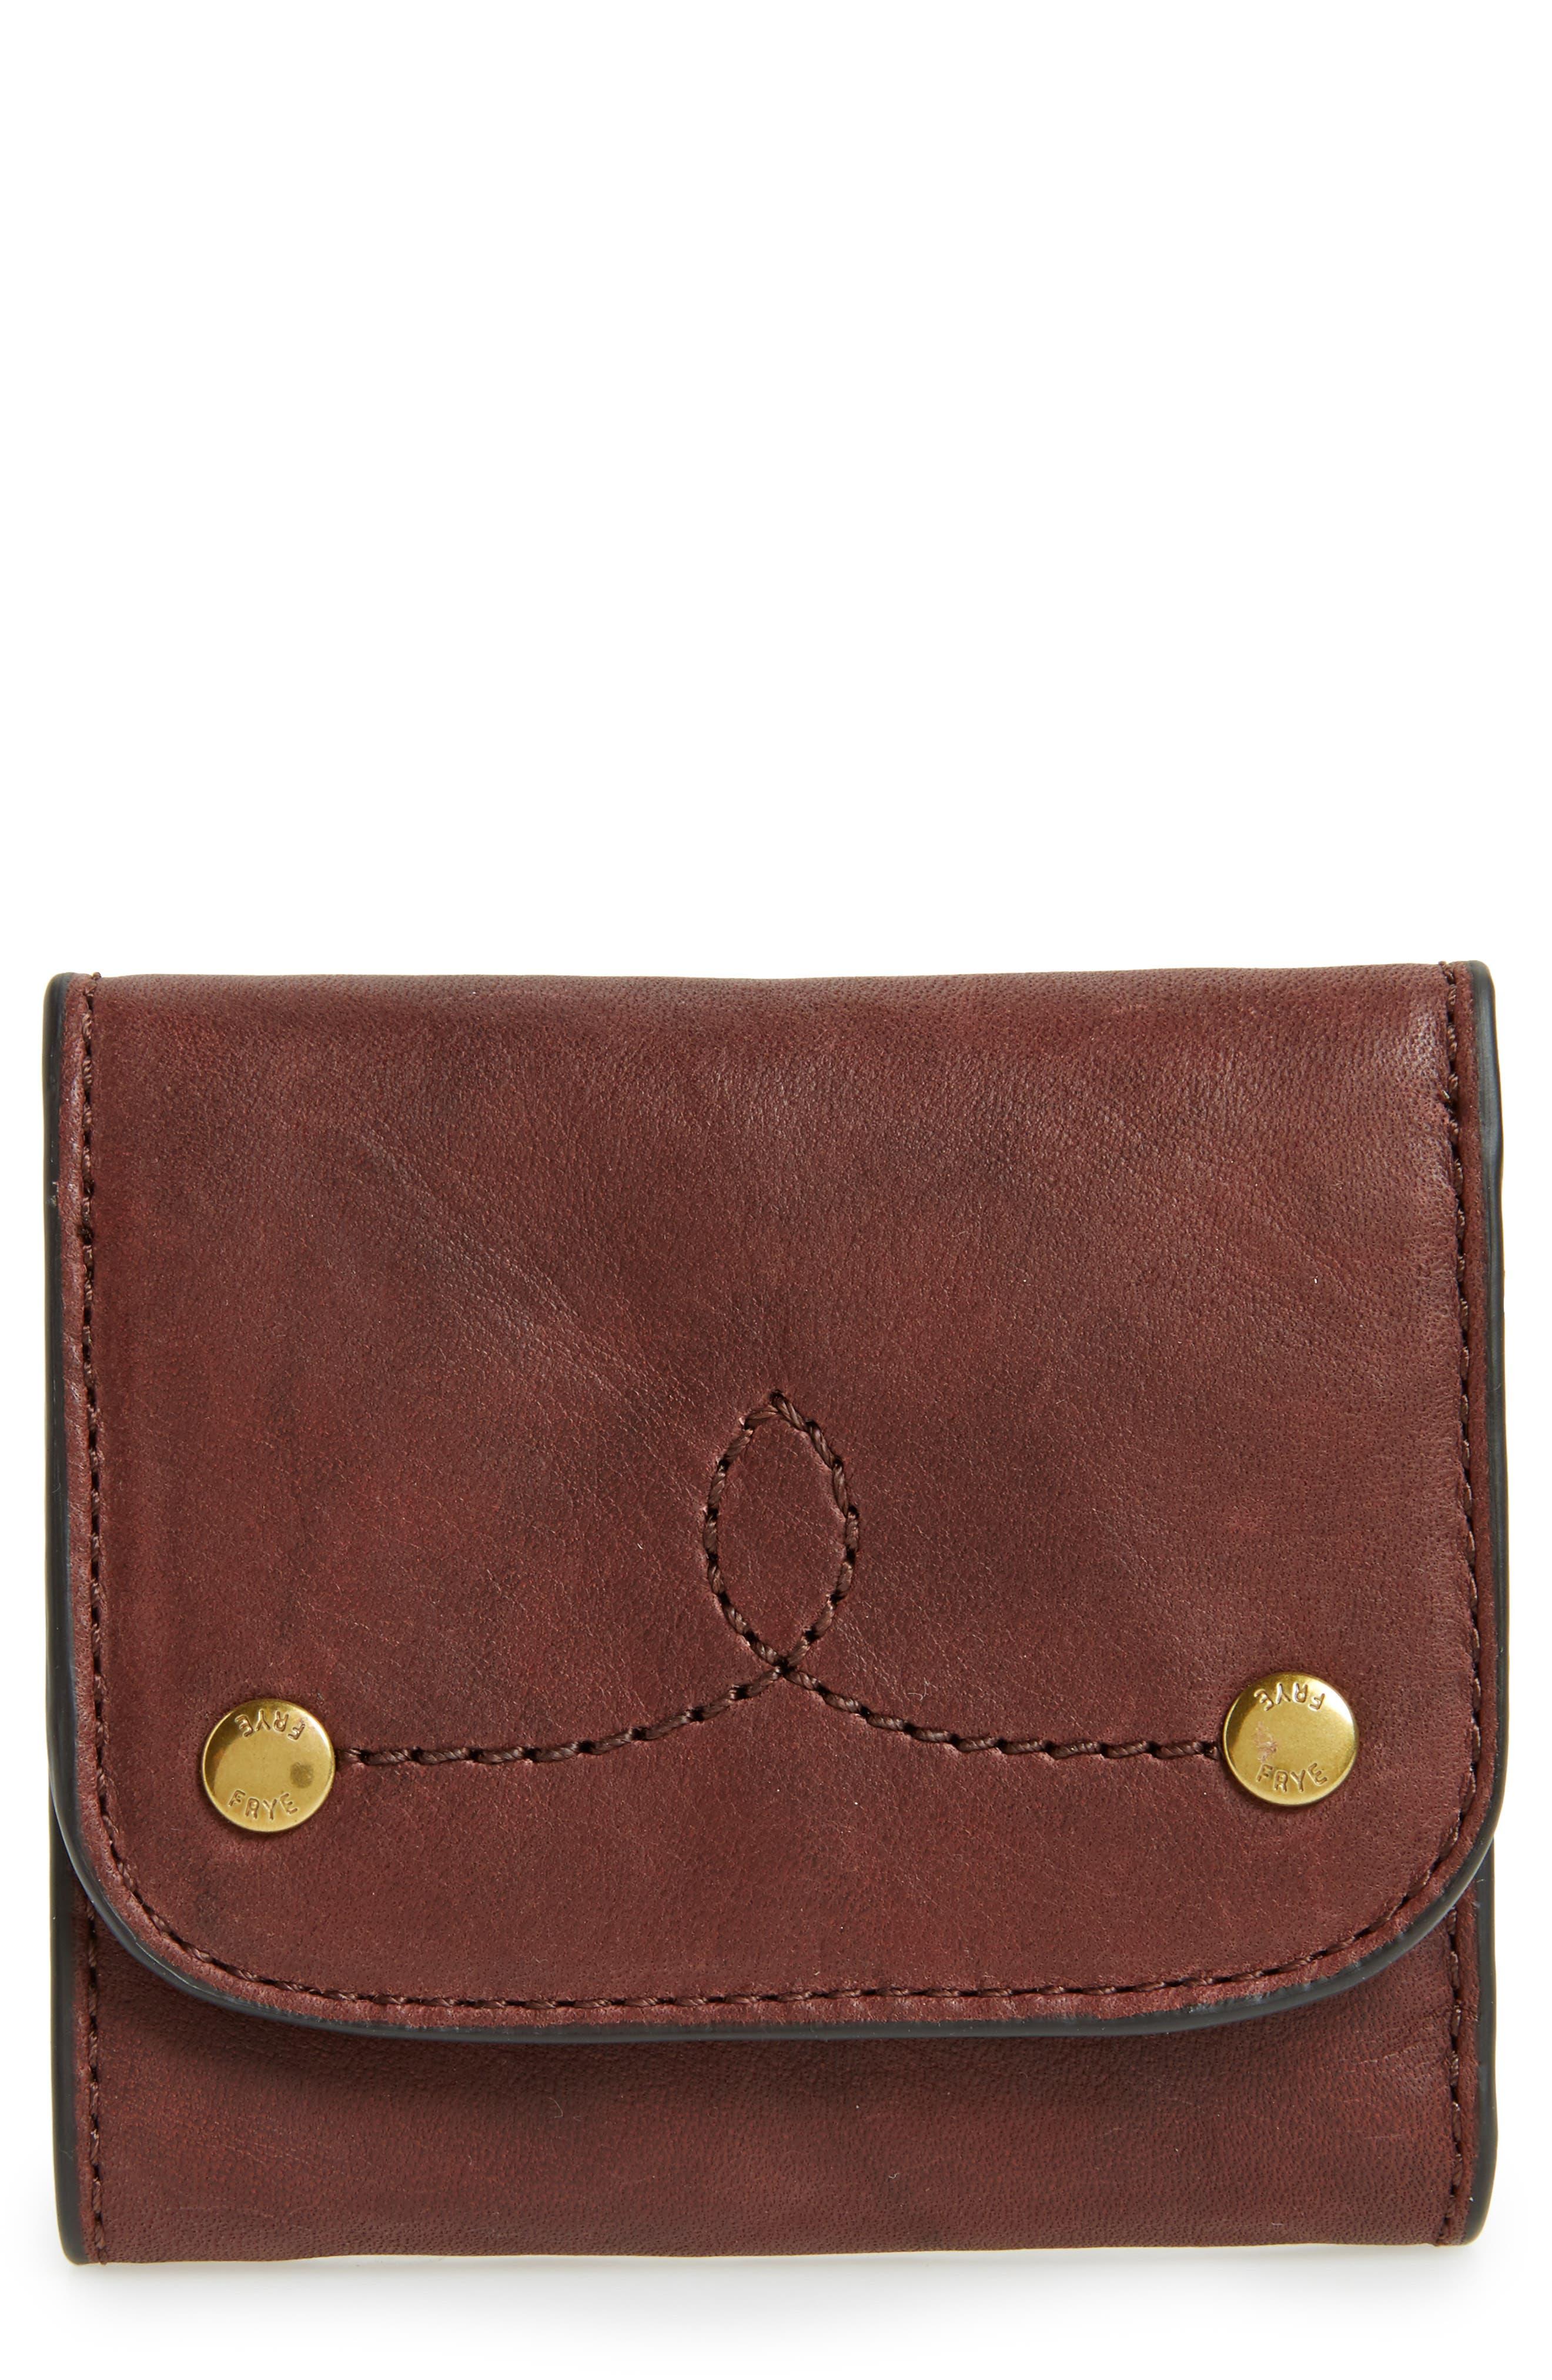 Medium Campus Rivet Leather Wallet,                             Main thumbnail 1, color,                             210